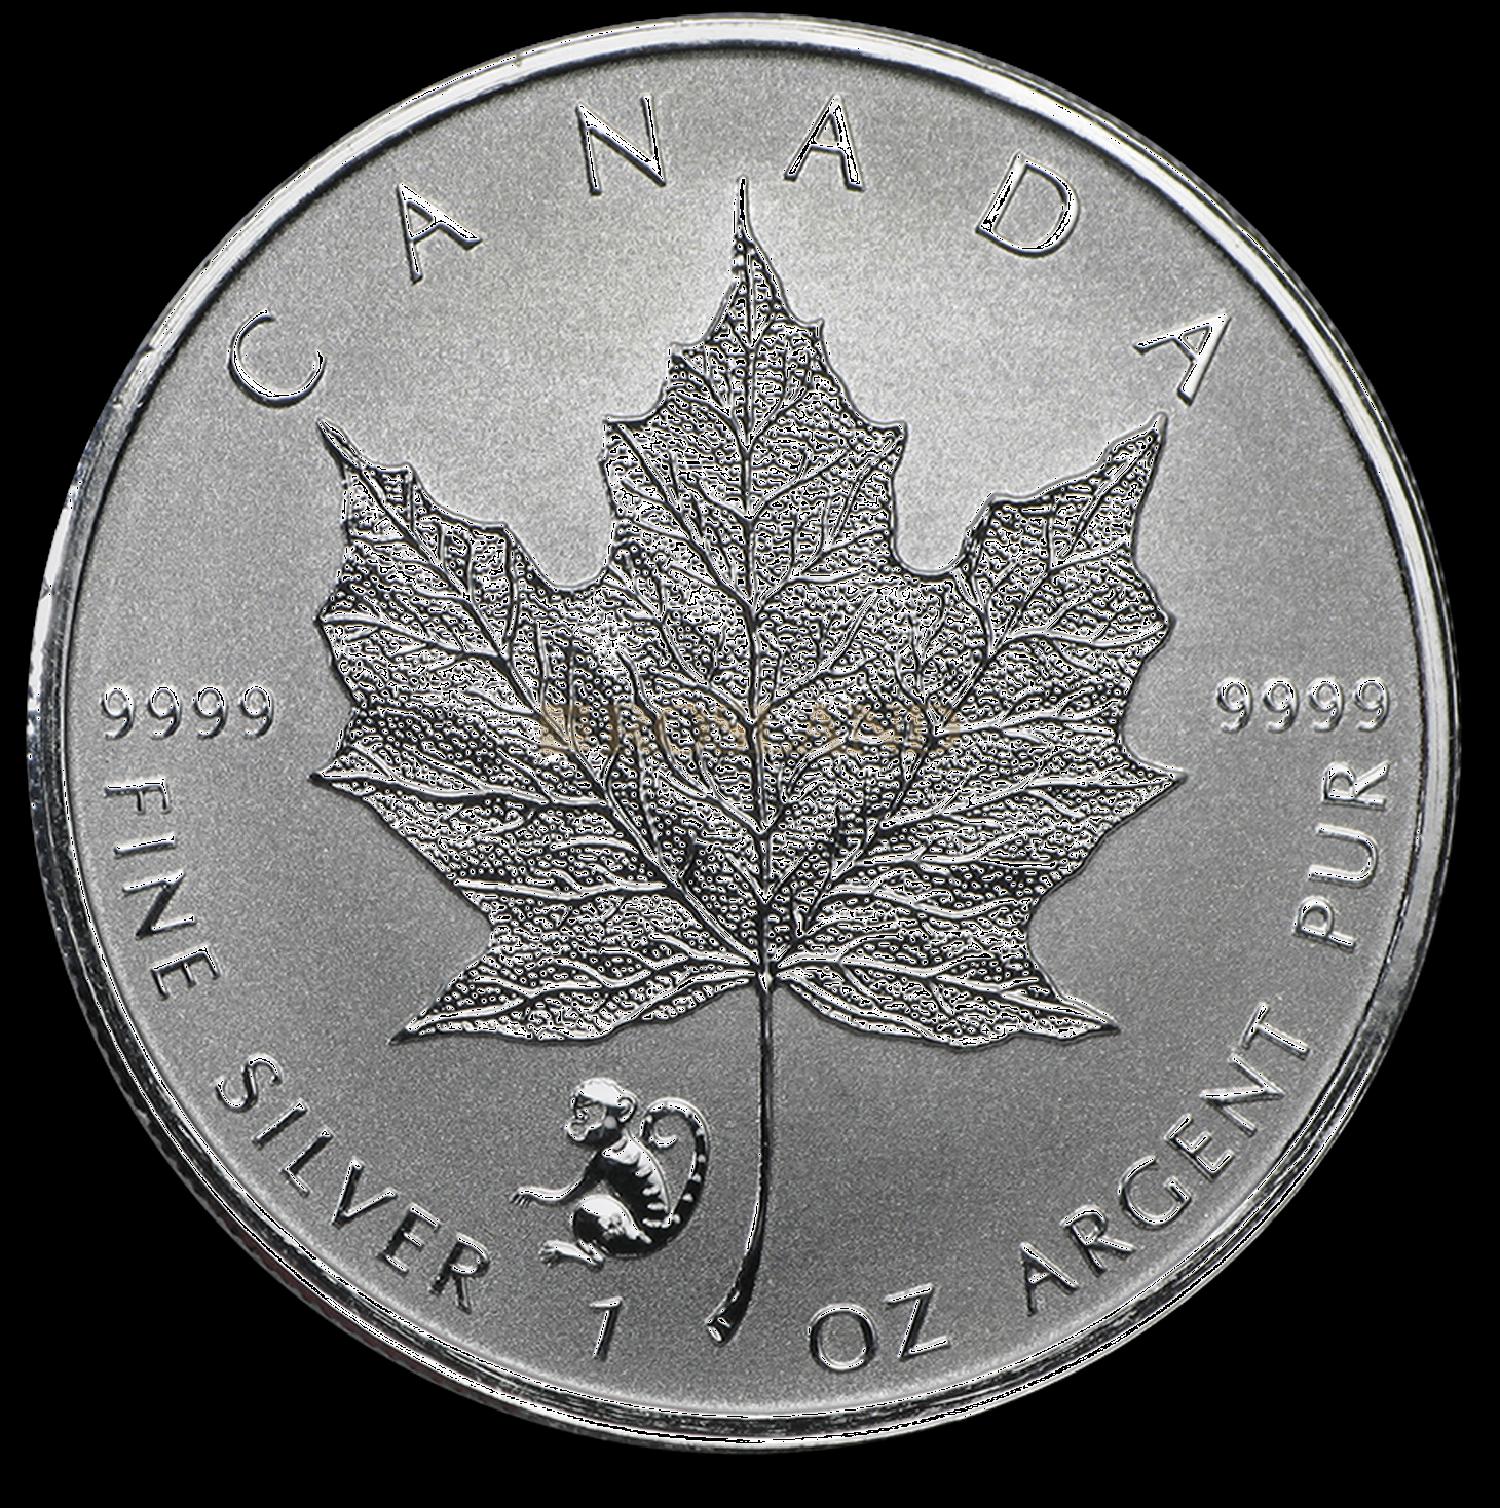 1 Unze Silbermünze Kanada Maple Leaf Lunar Affe 2016